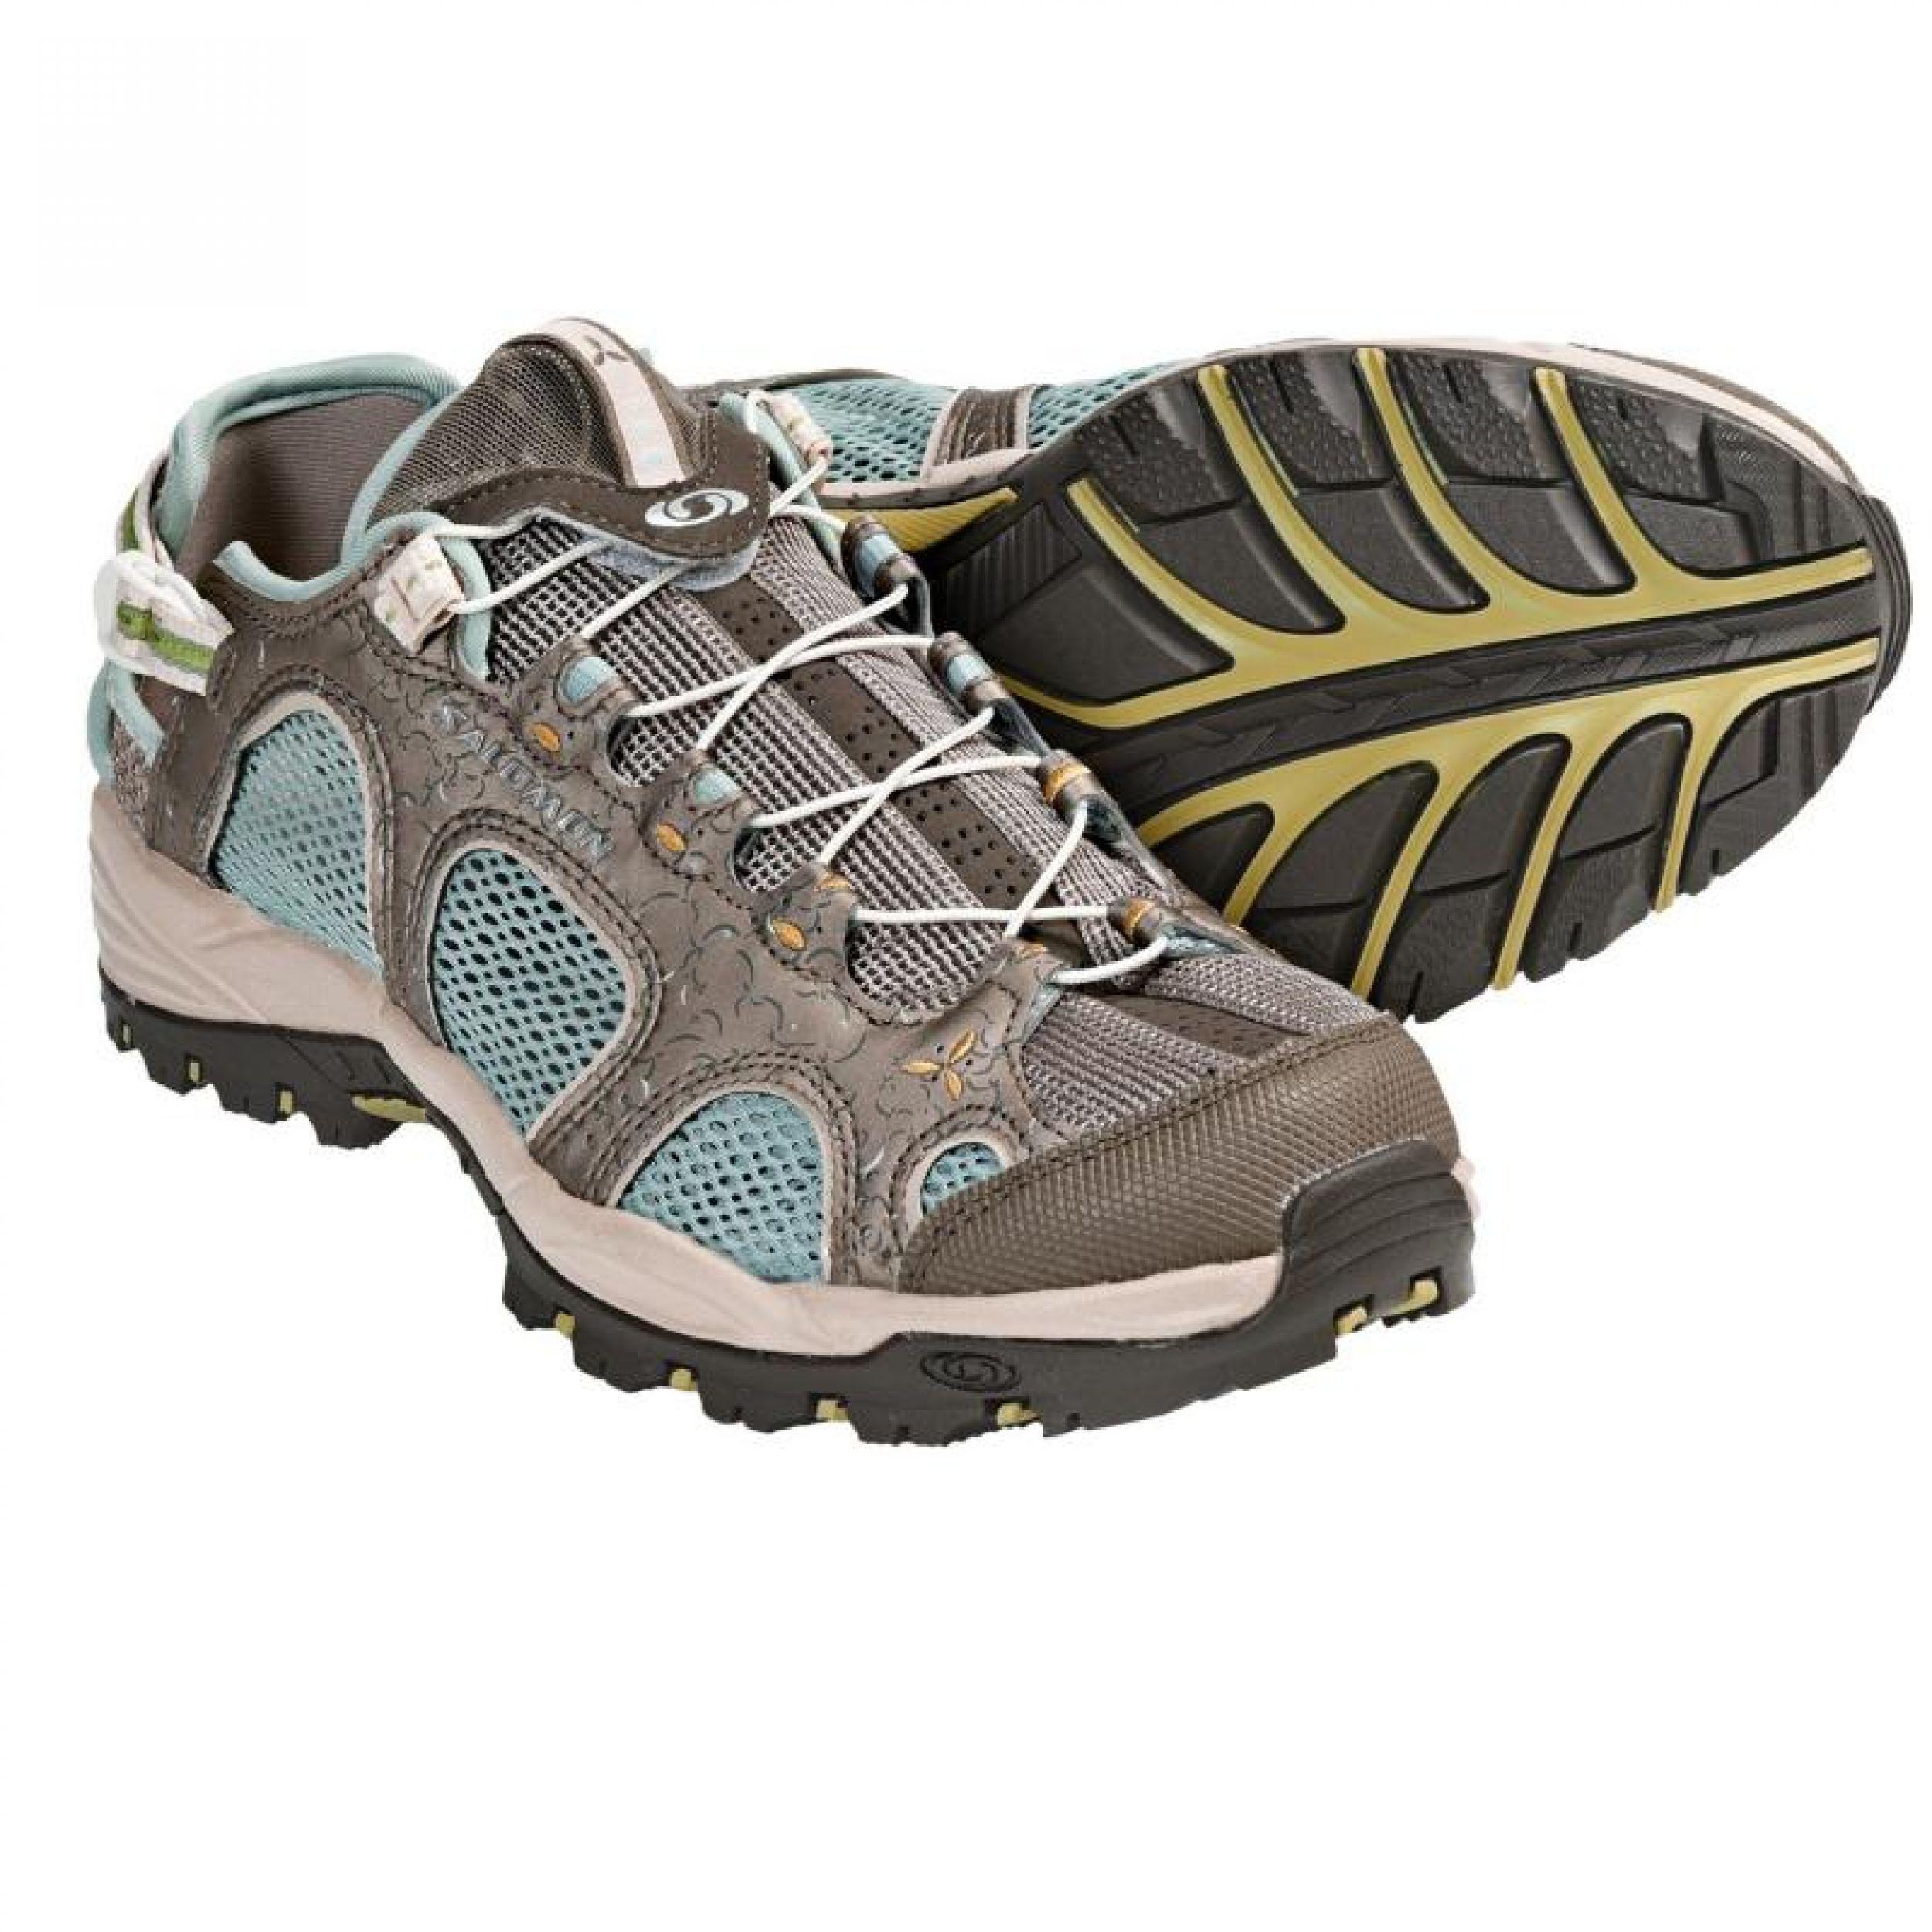 salomon-techamphibian-2-mat-shoes-for-women-in-thyme-eucalyptusp4141u_031500.3_2.jpg